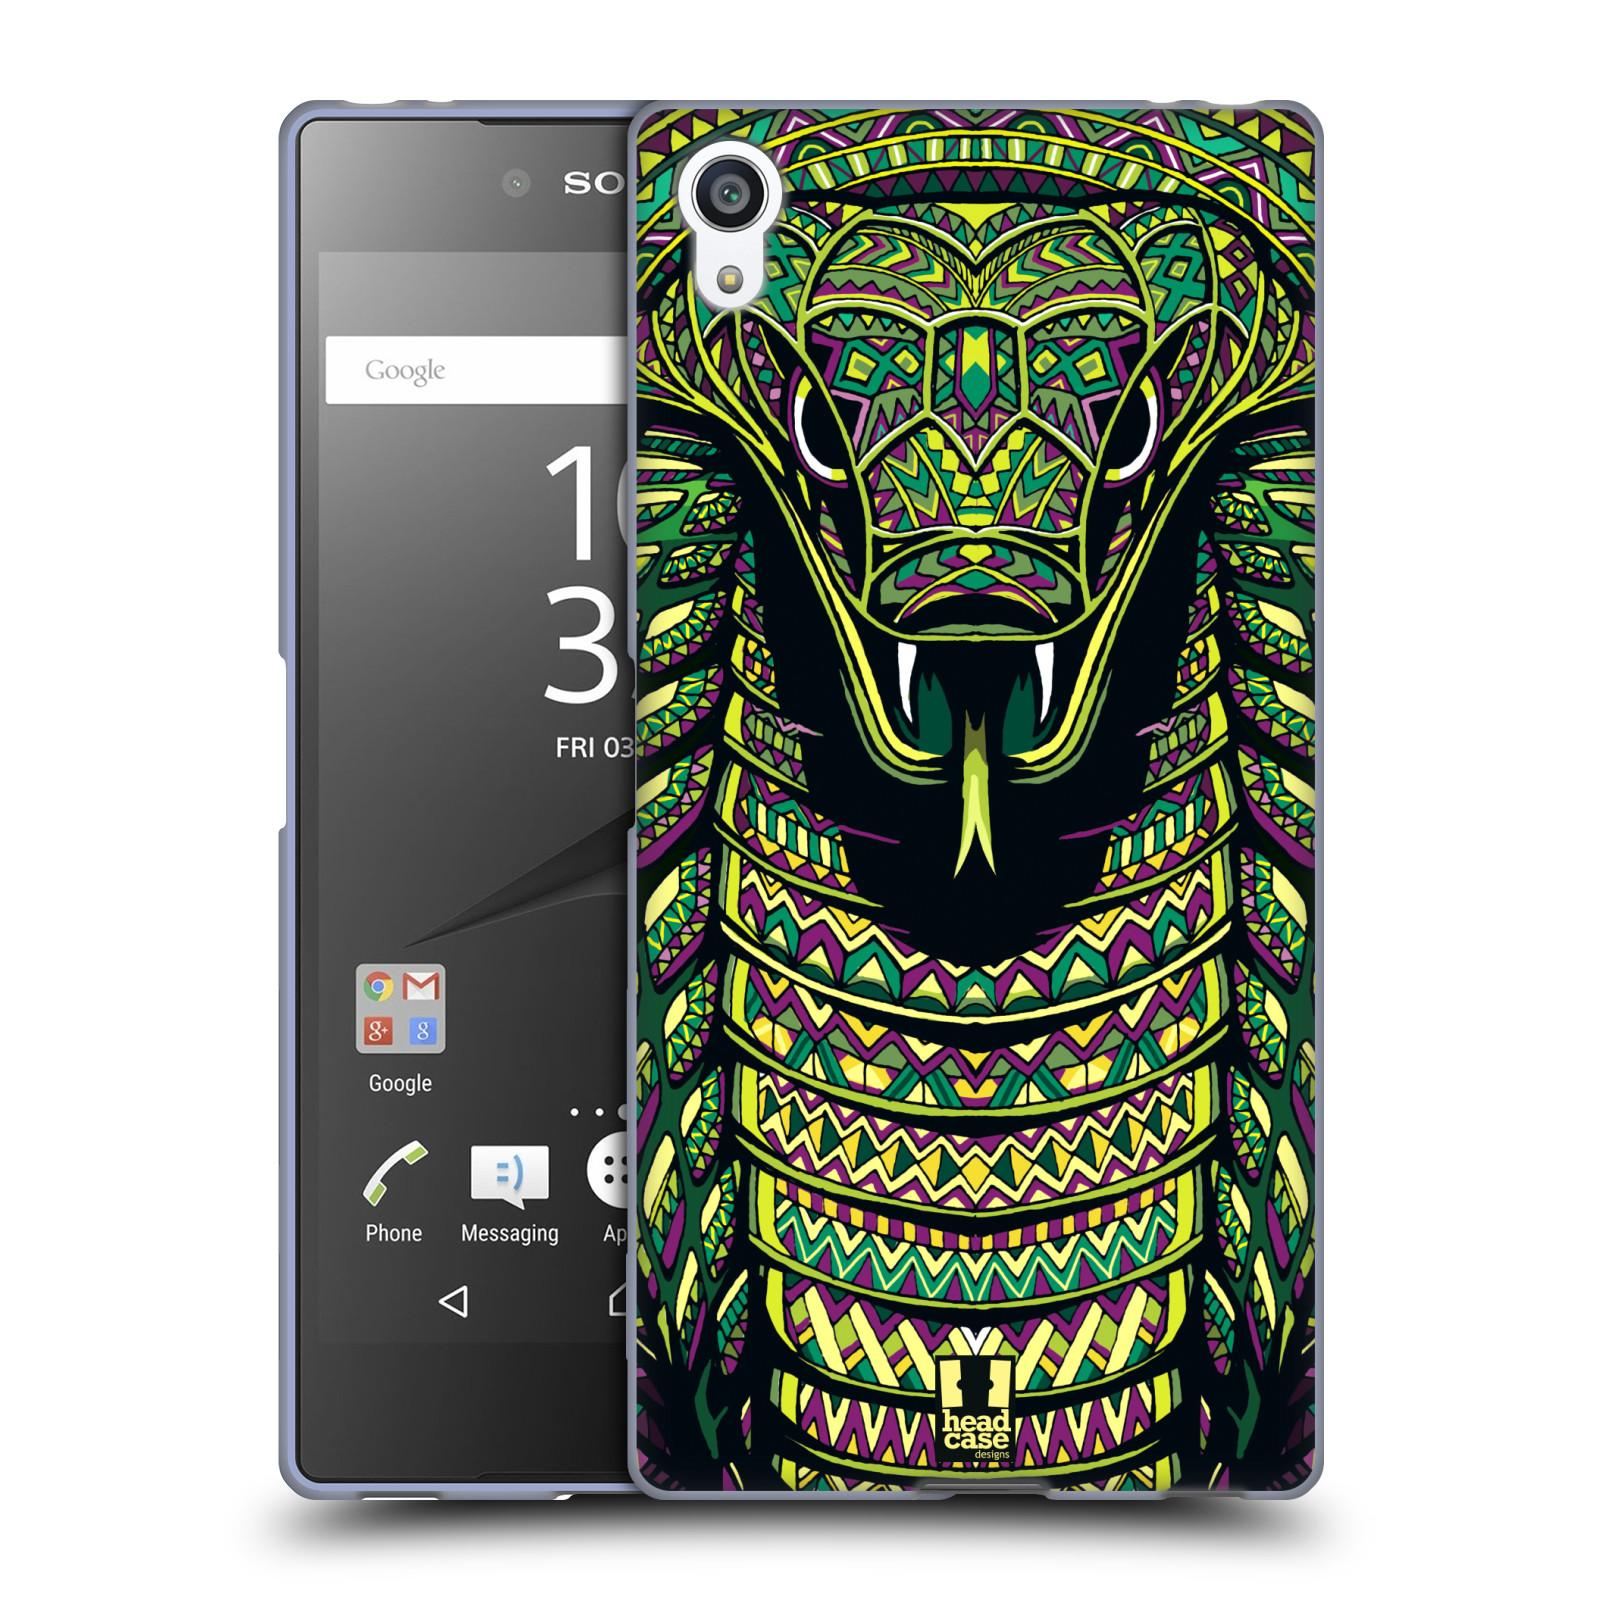 Silikonové pouzdro na mobil Sony Xperia Z5 Premium HEAD CASE AZTEC HAD